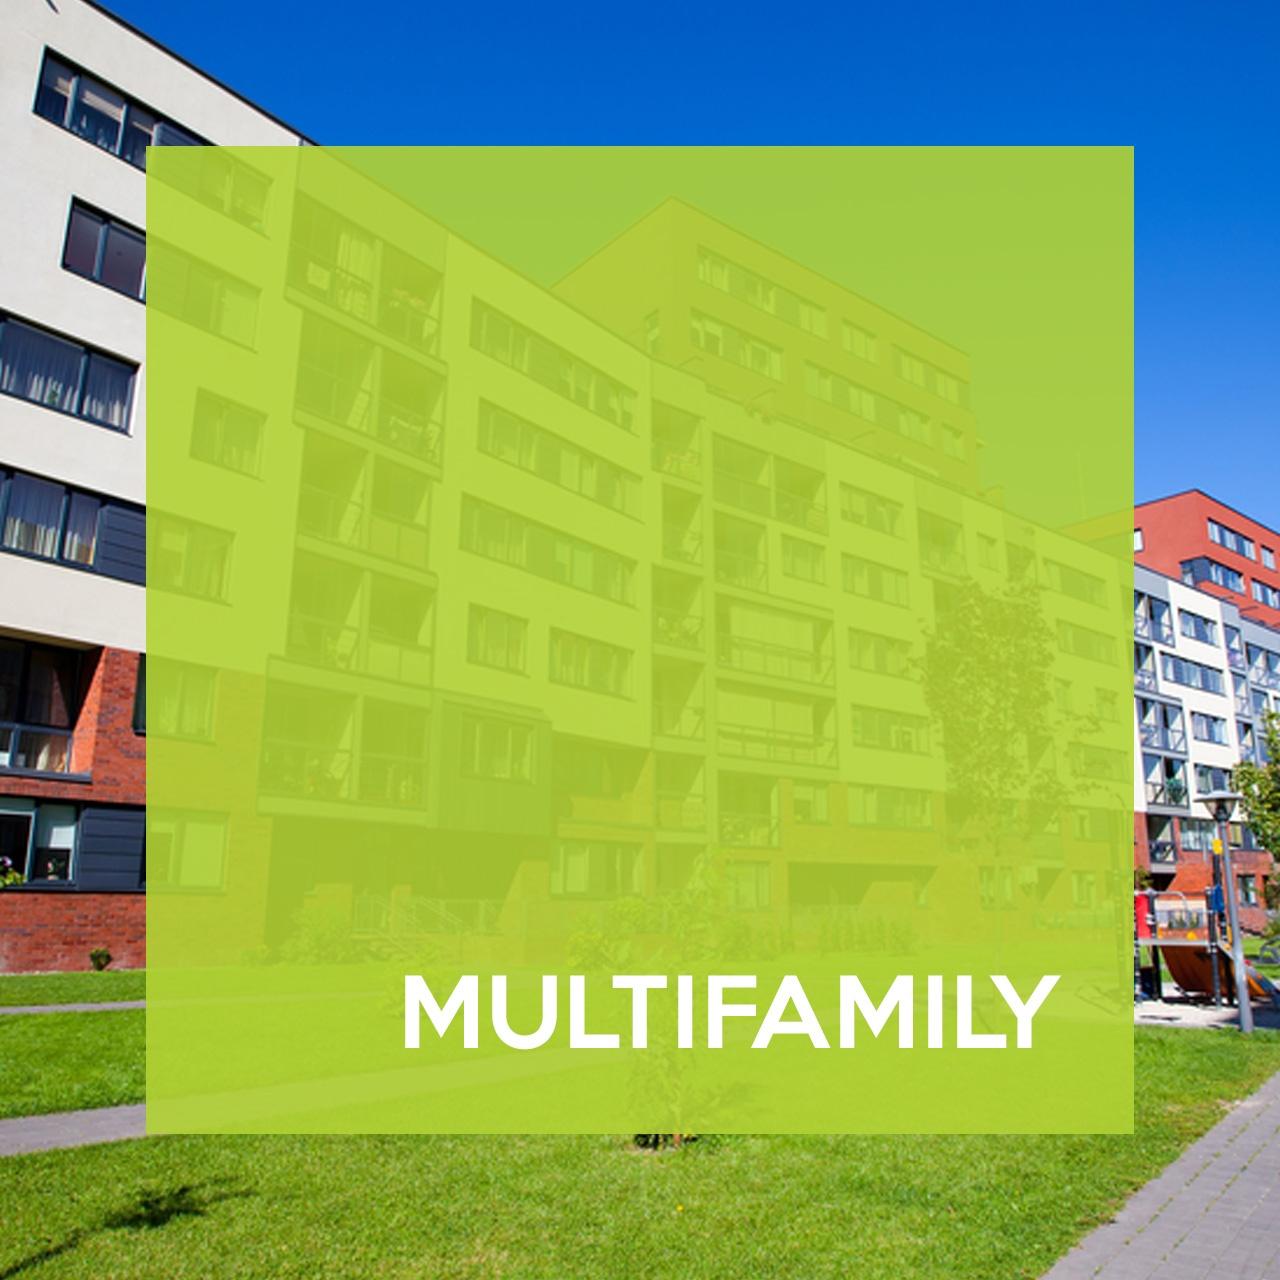 AMI_COMMERCIAL__multifamily_-_023.jpg